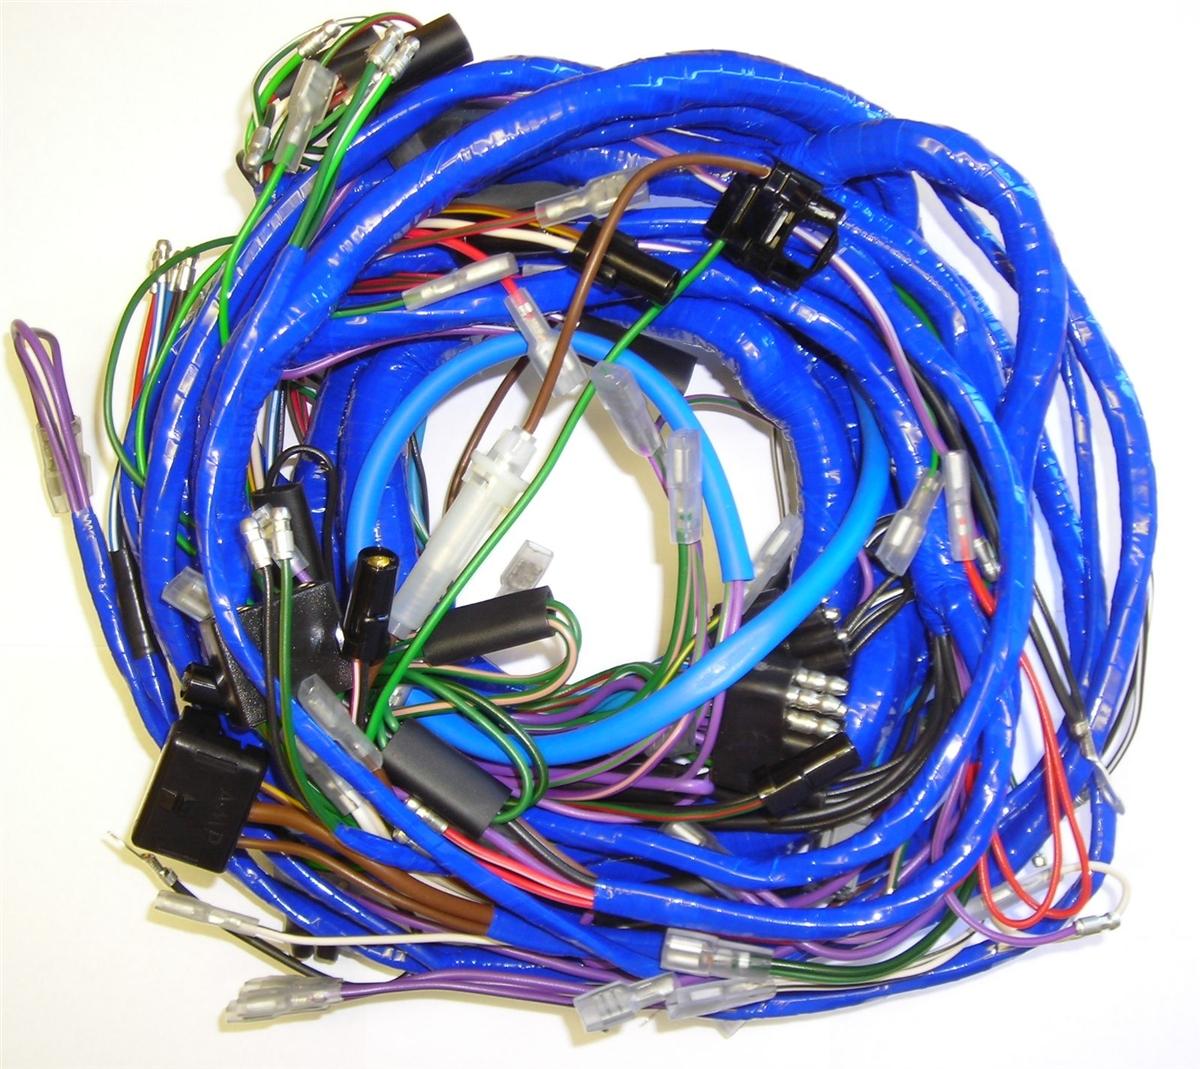 hight resolution of main wiring harness mg midget 1972 mg midget wiring harness mg midget wiring harness